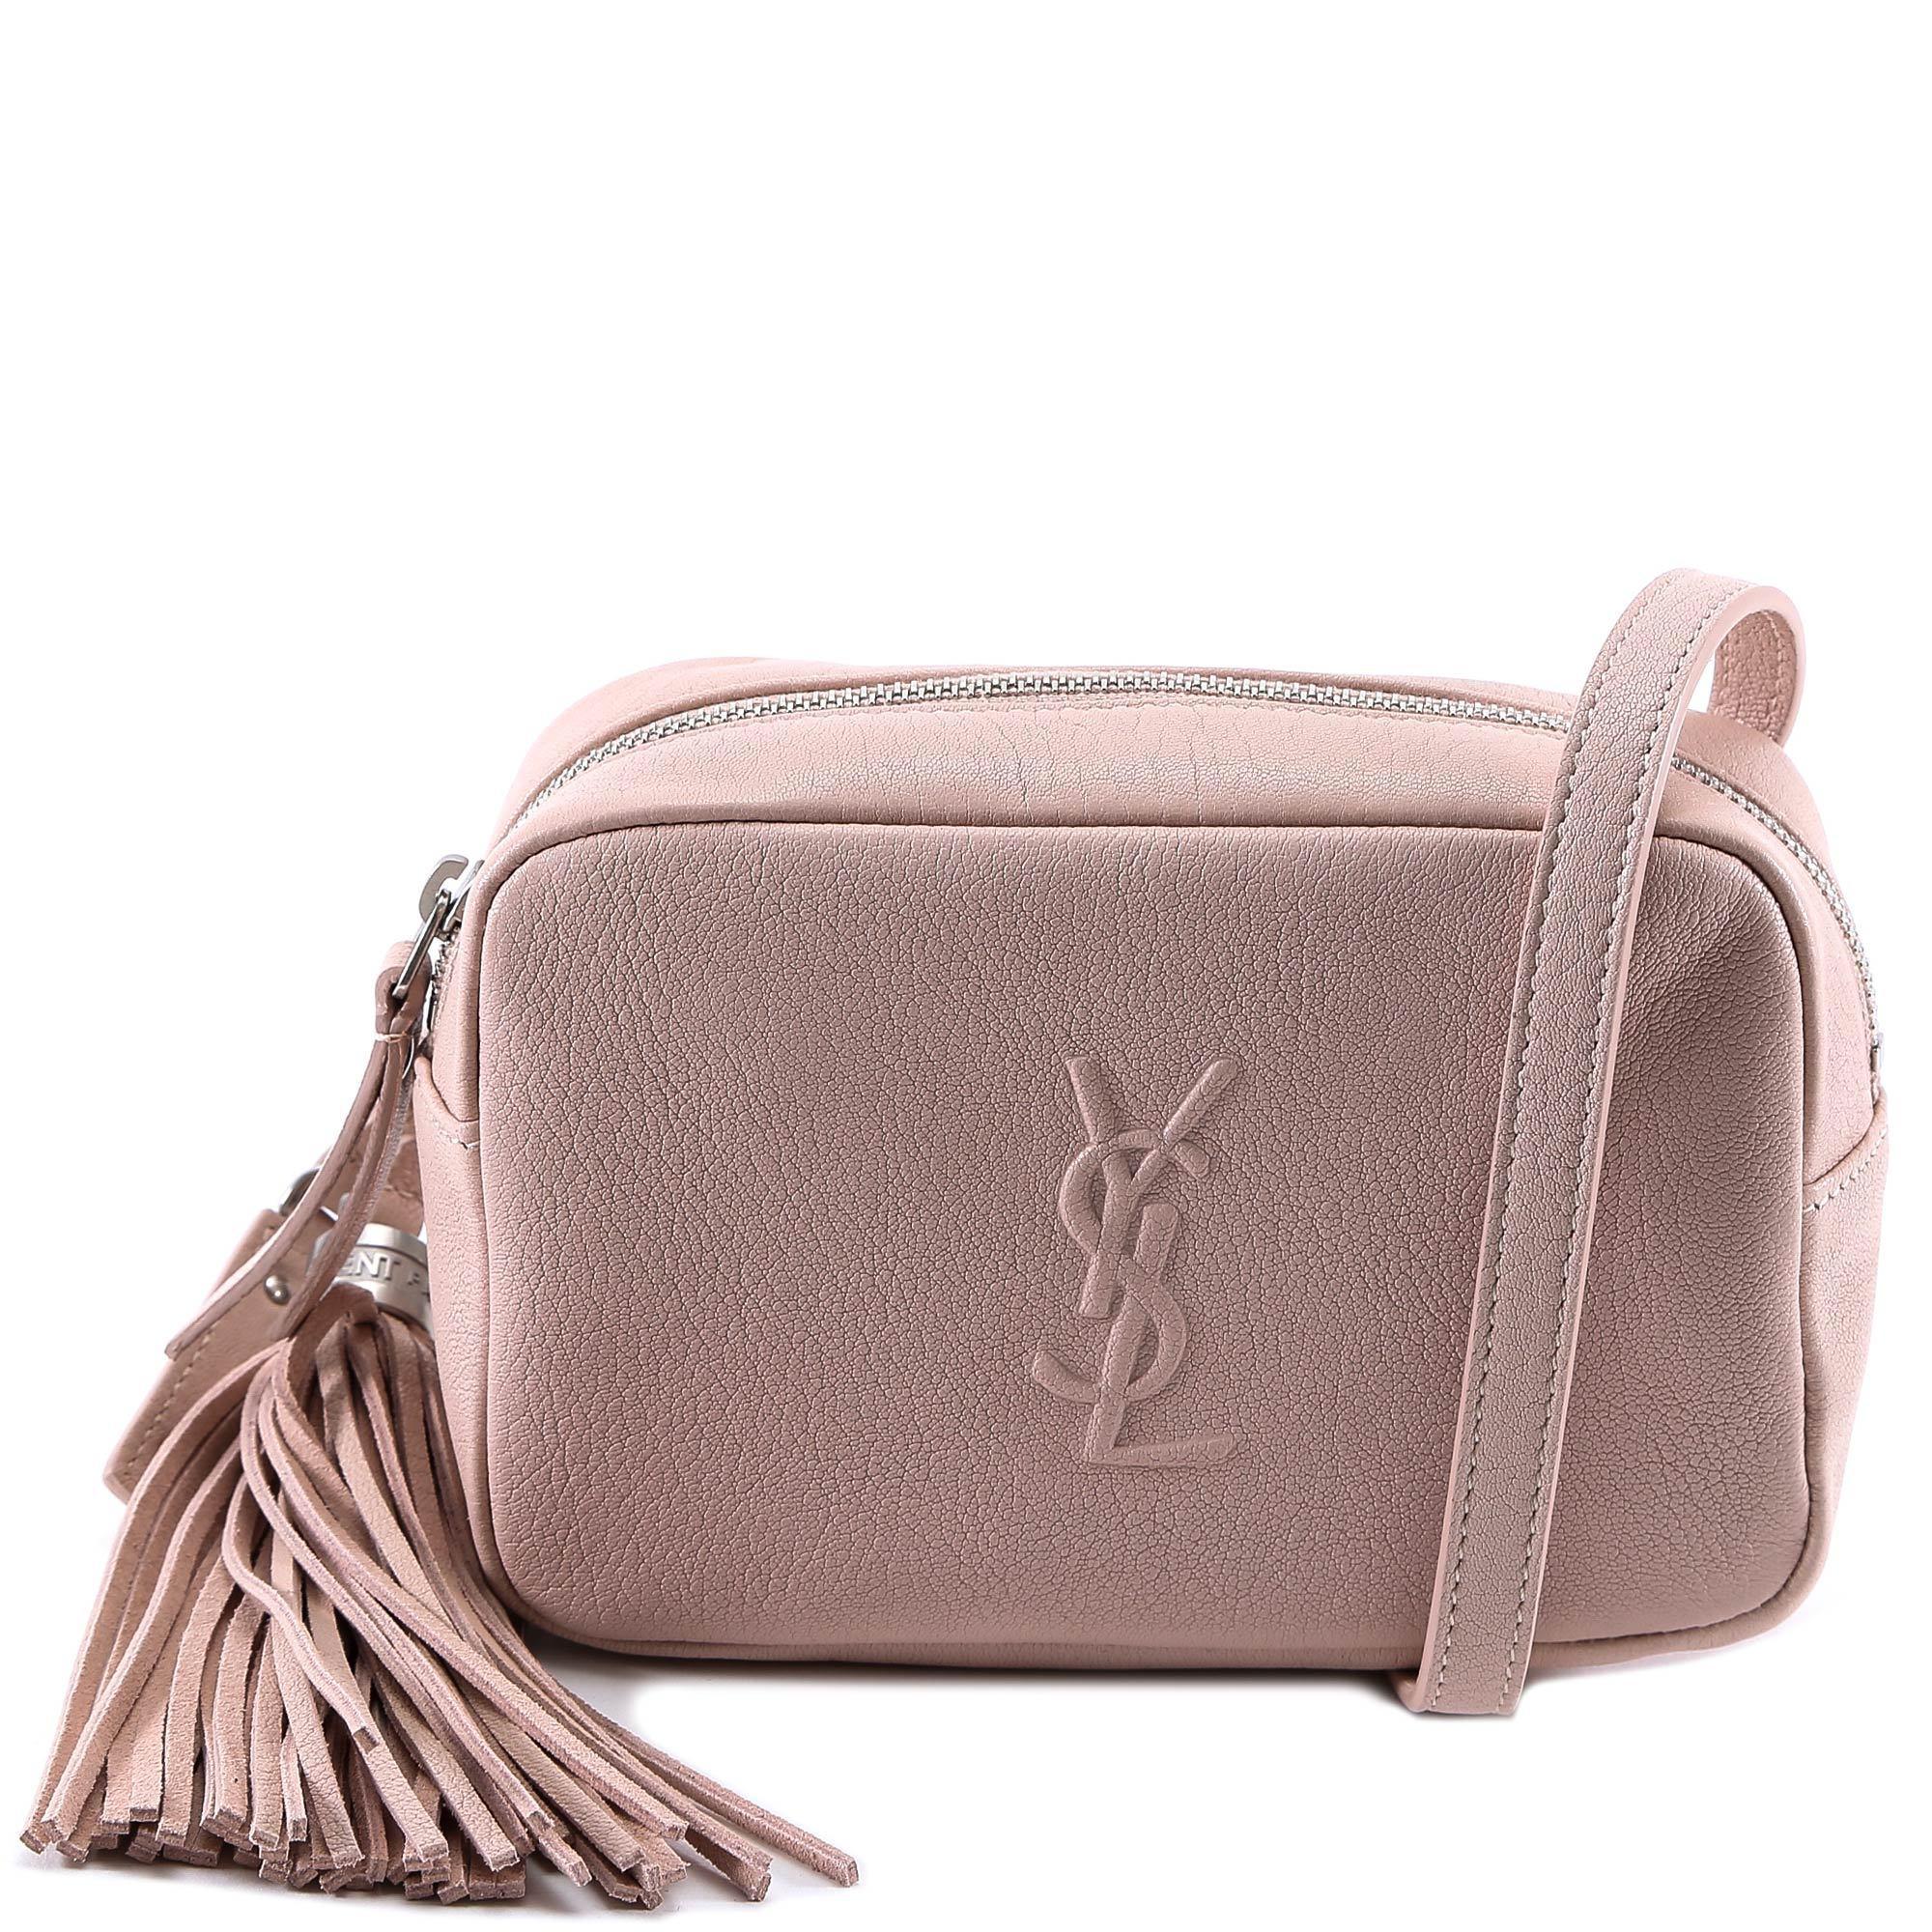 Lyst - Saint Laurent Monogram Belt Bag in Pink 841f66ba520da